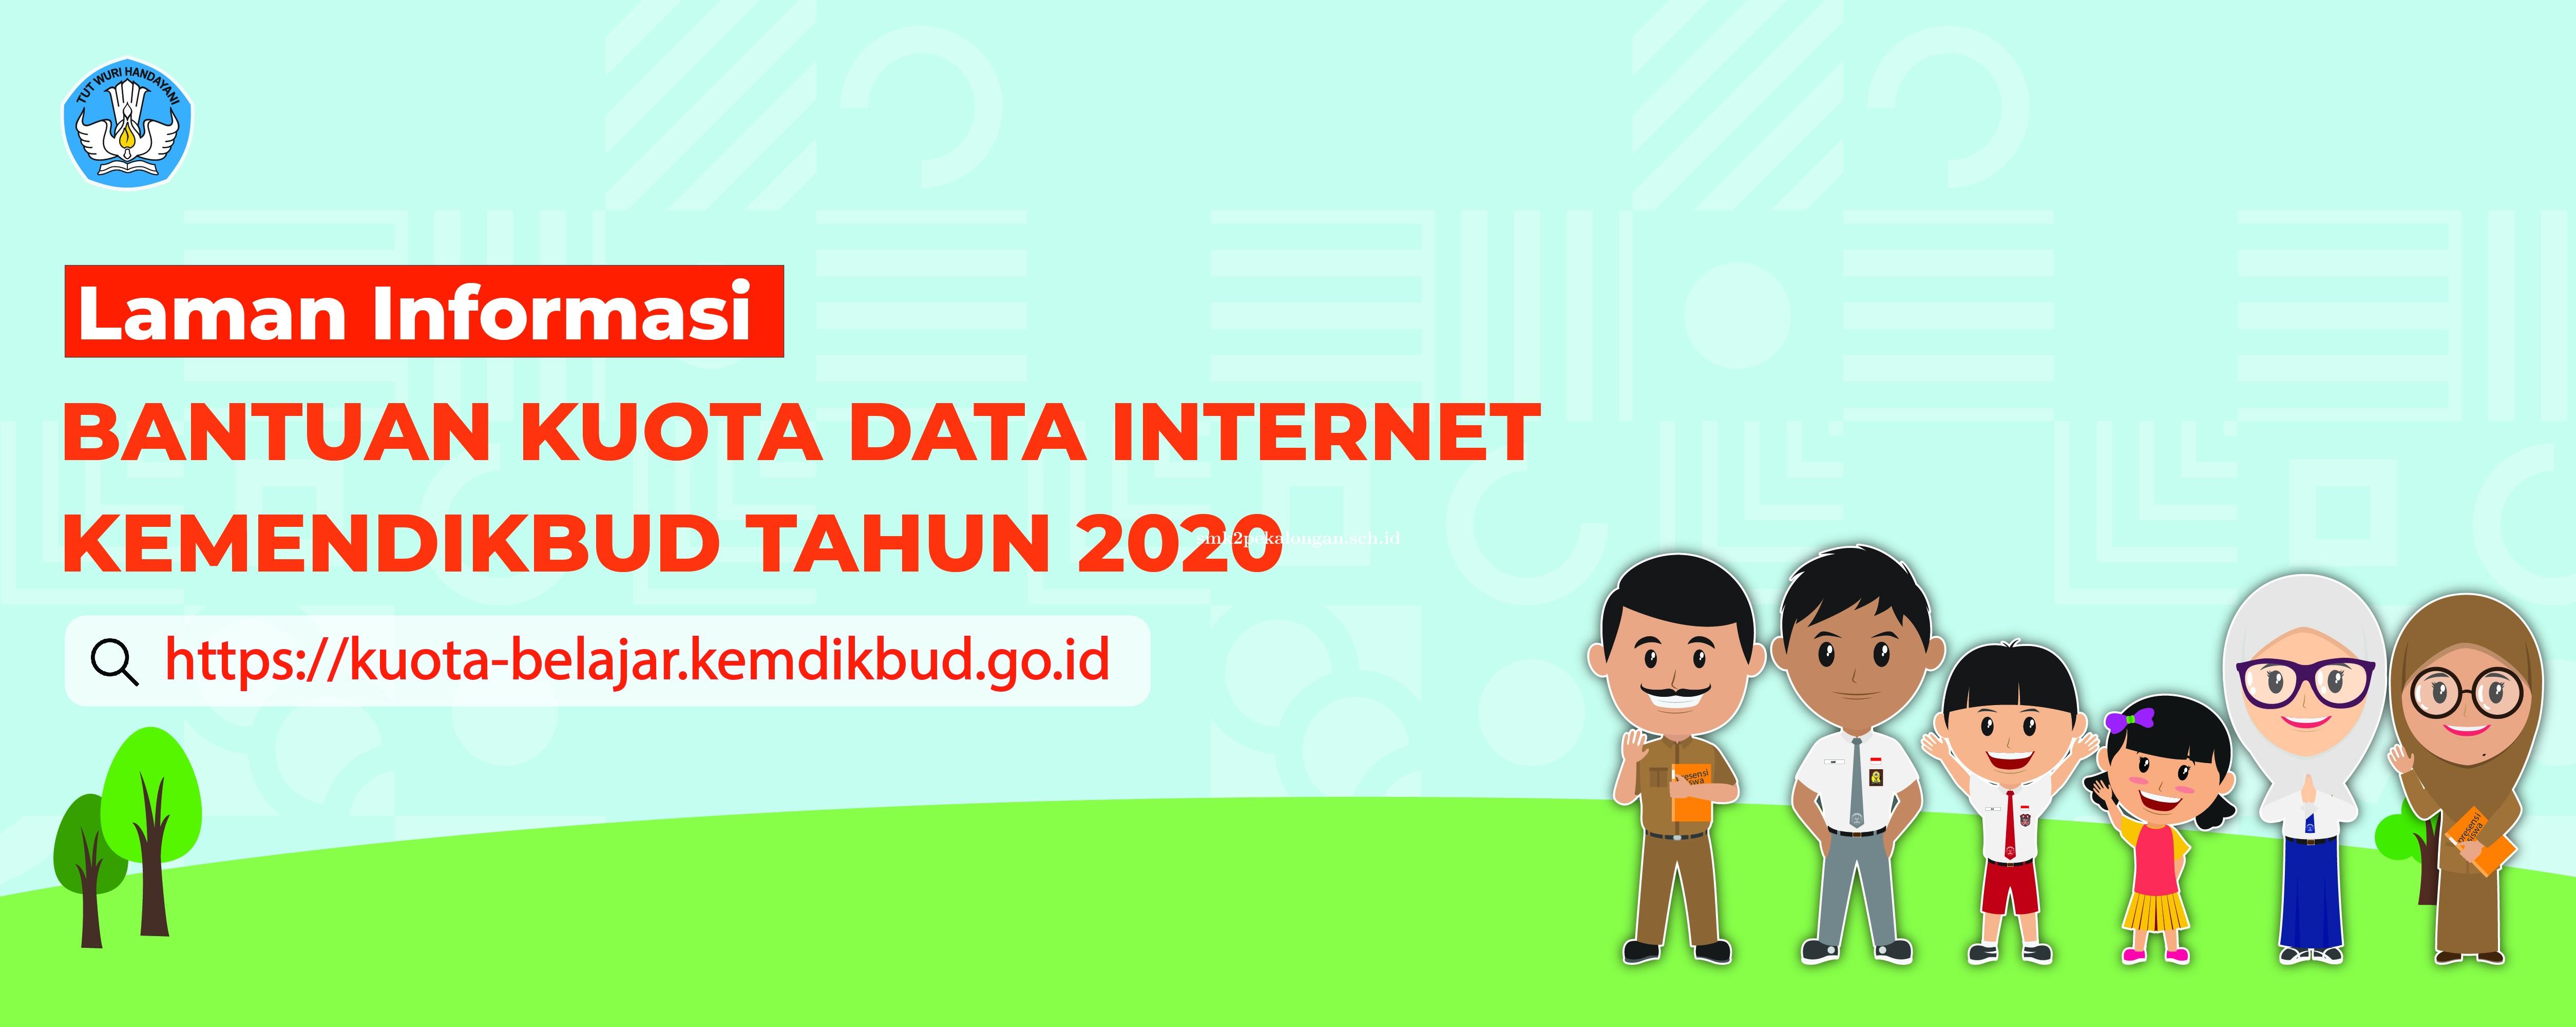 Bantuan Kuota Data Internet 2020